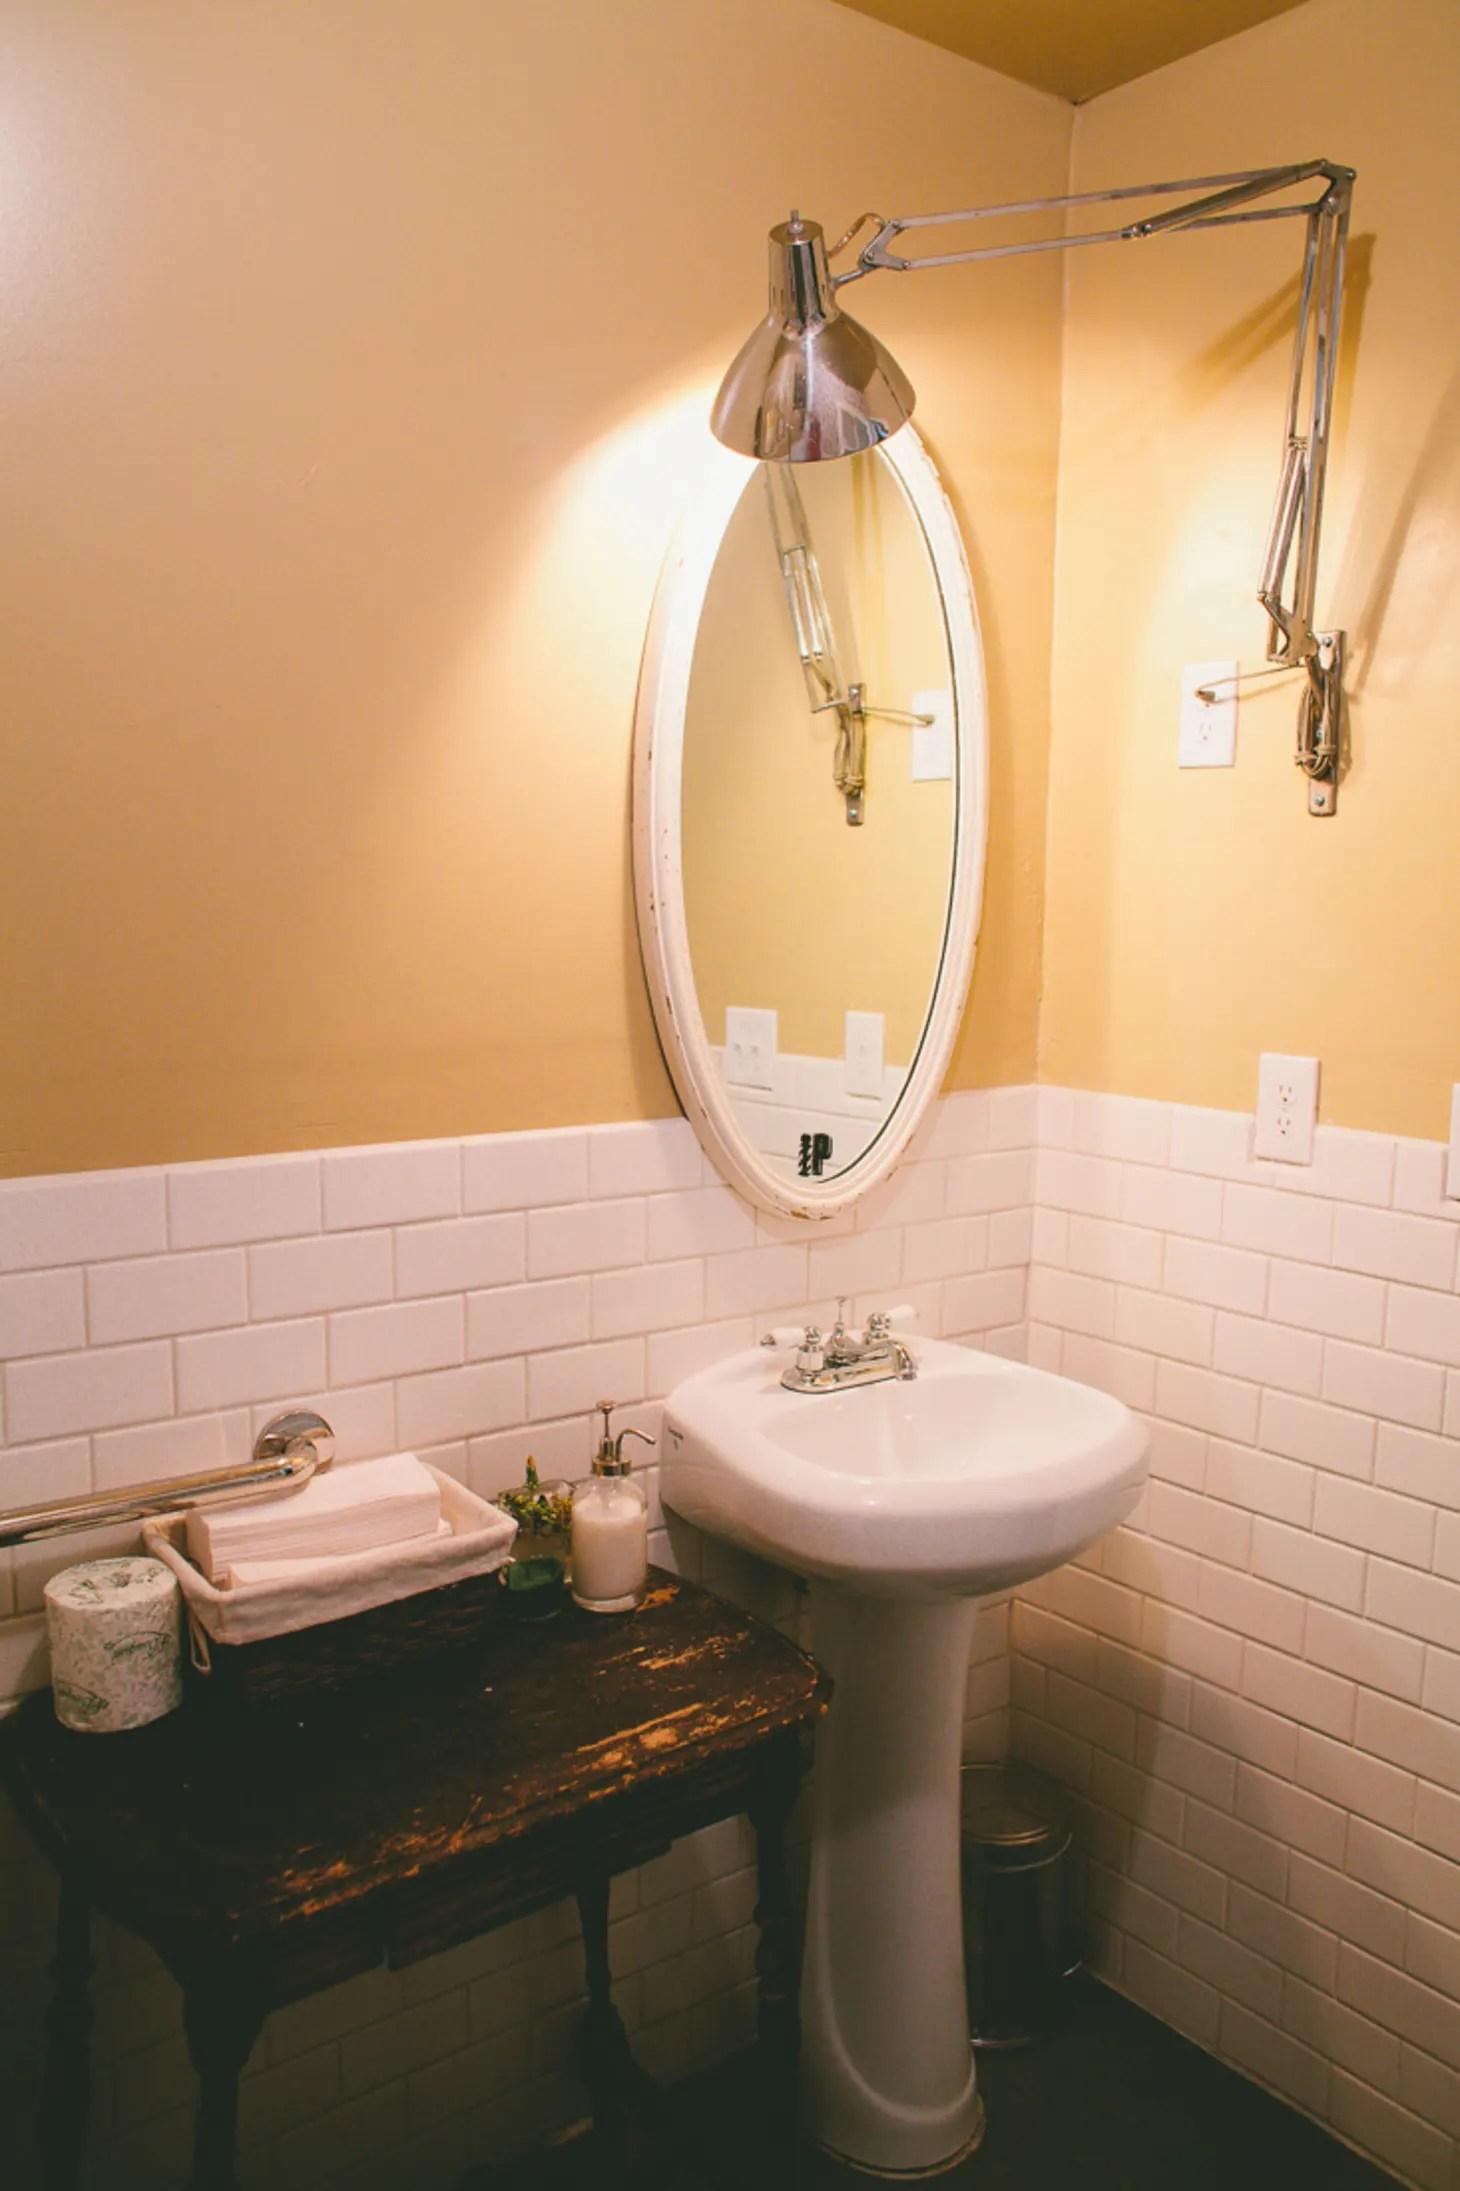 Small Bathroom Ideas: 6 Room Brightening Tips for Tiny ... on Small Restroom Ideas  id=86534